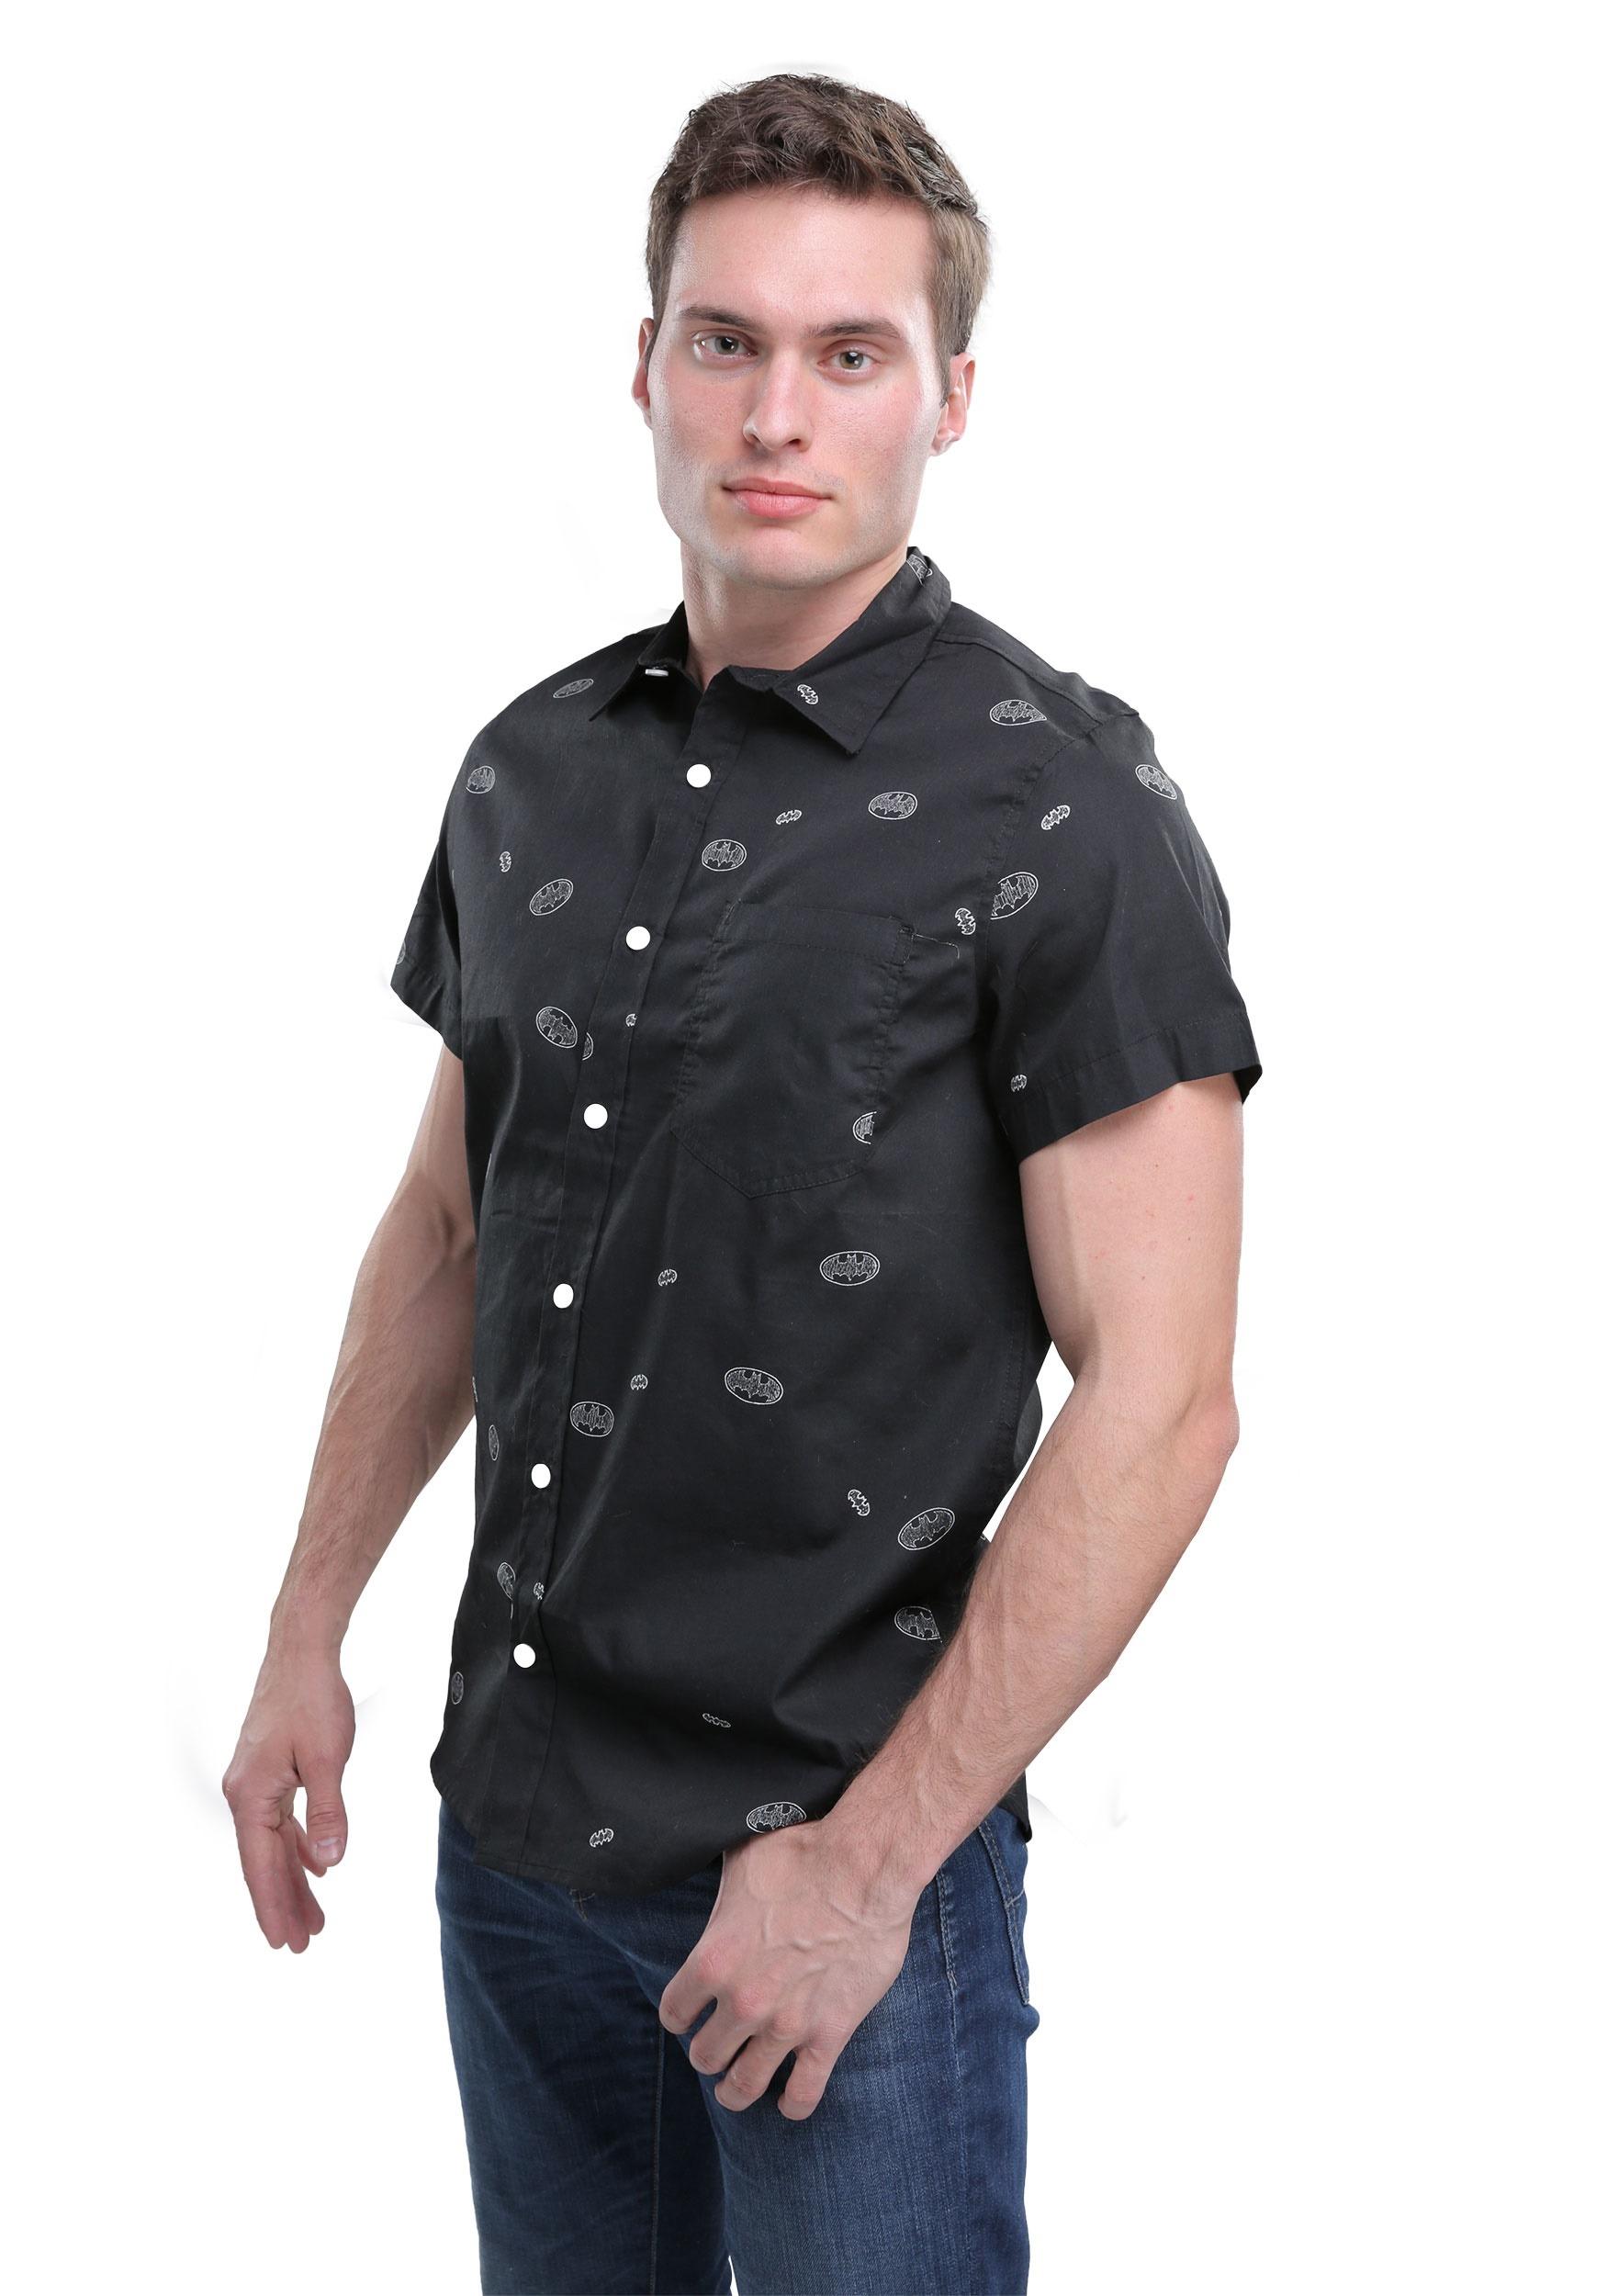 Dc comics batman woven button down shirt for men for Mens button down shirts